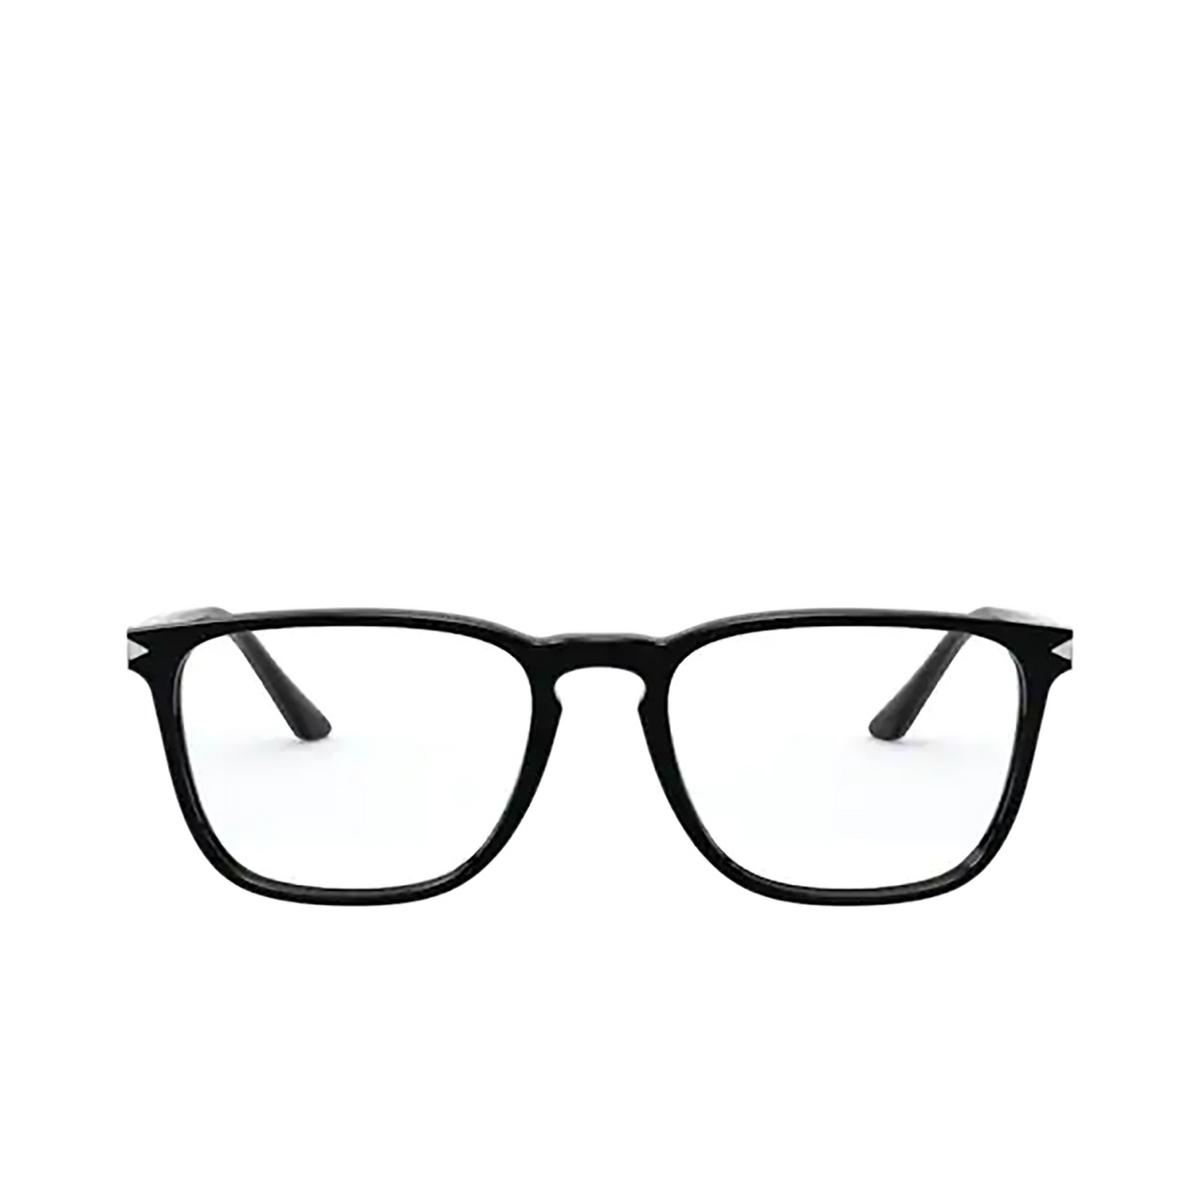 Giorgio Armani® Square Eyeglasses: AR7193 color Black 5001 - front view.